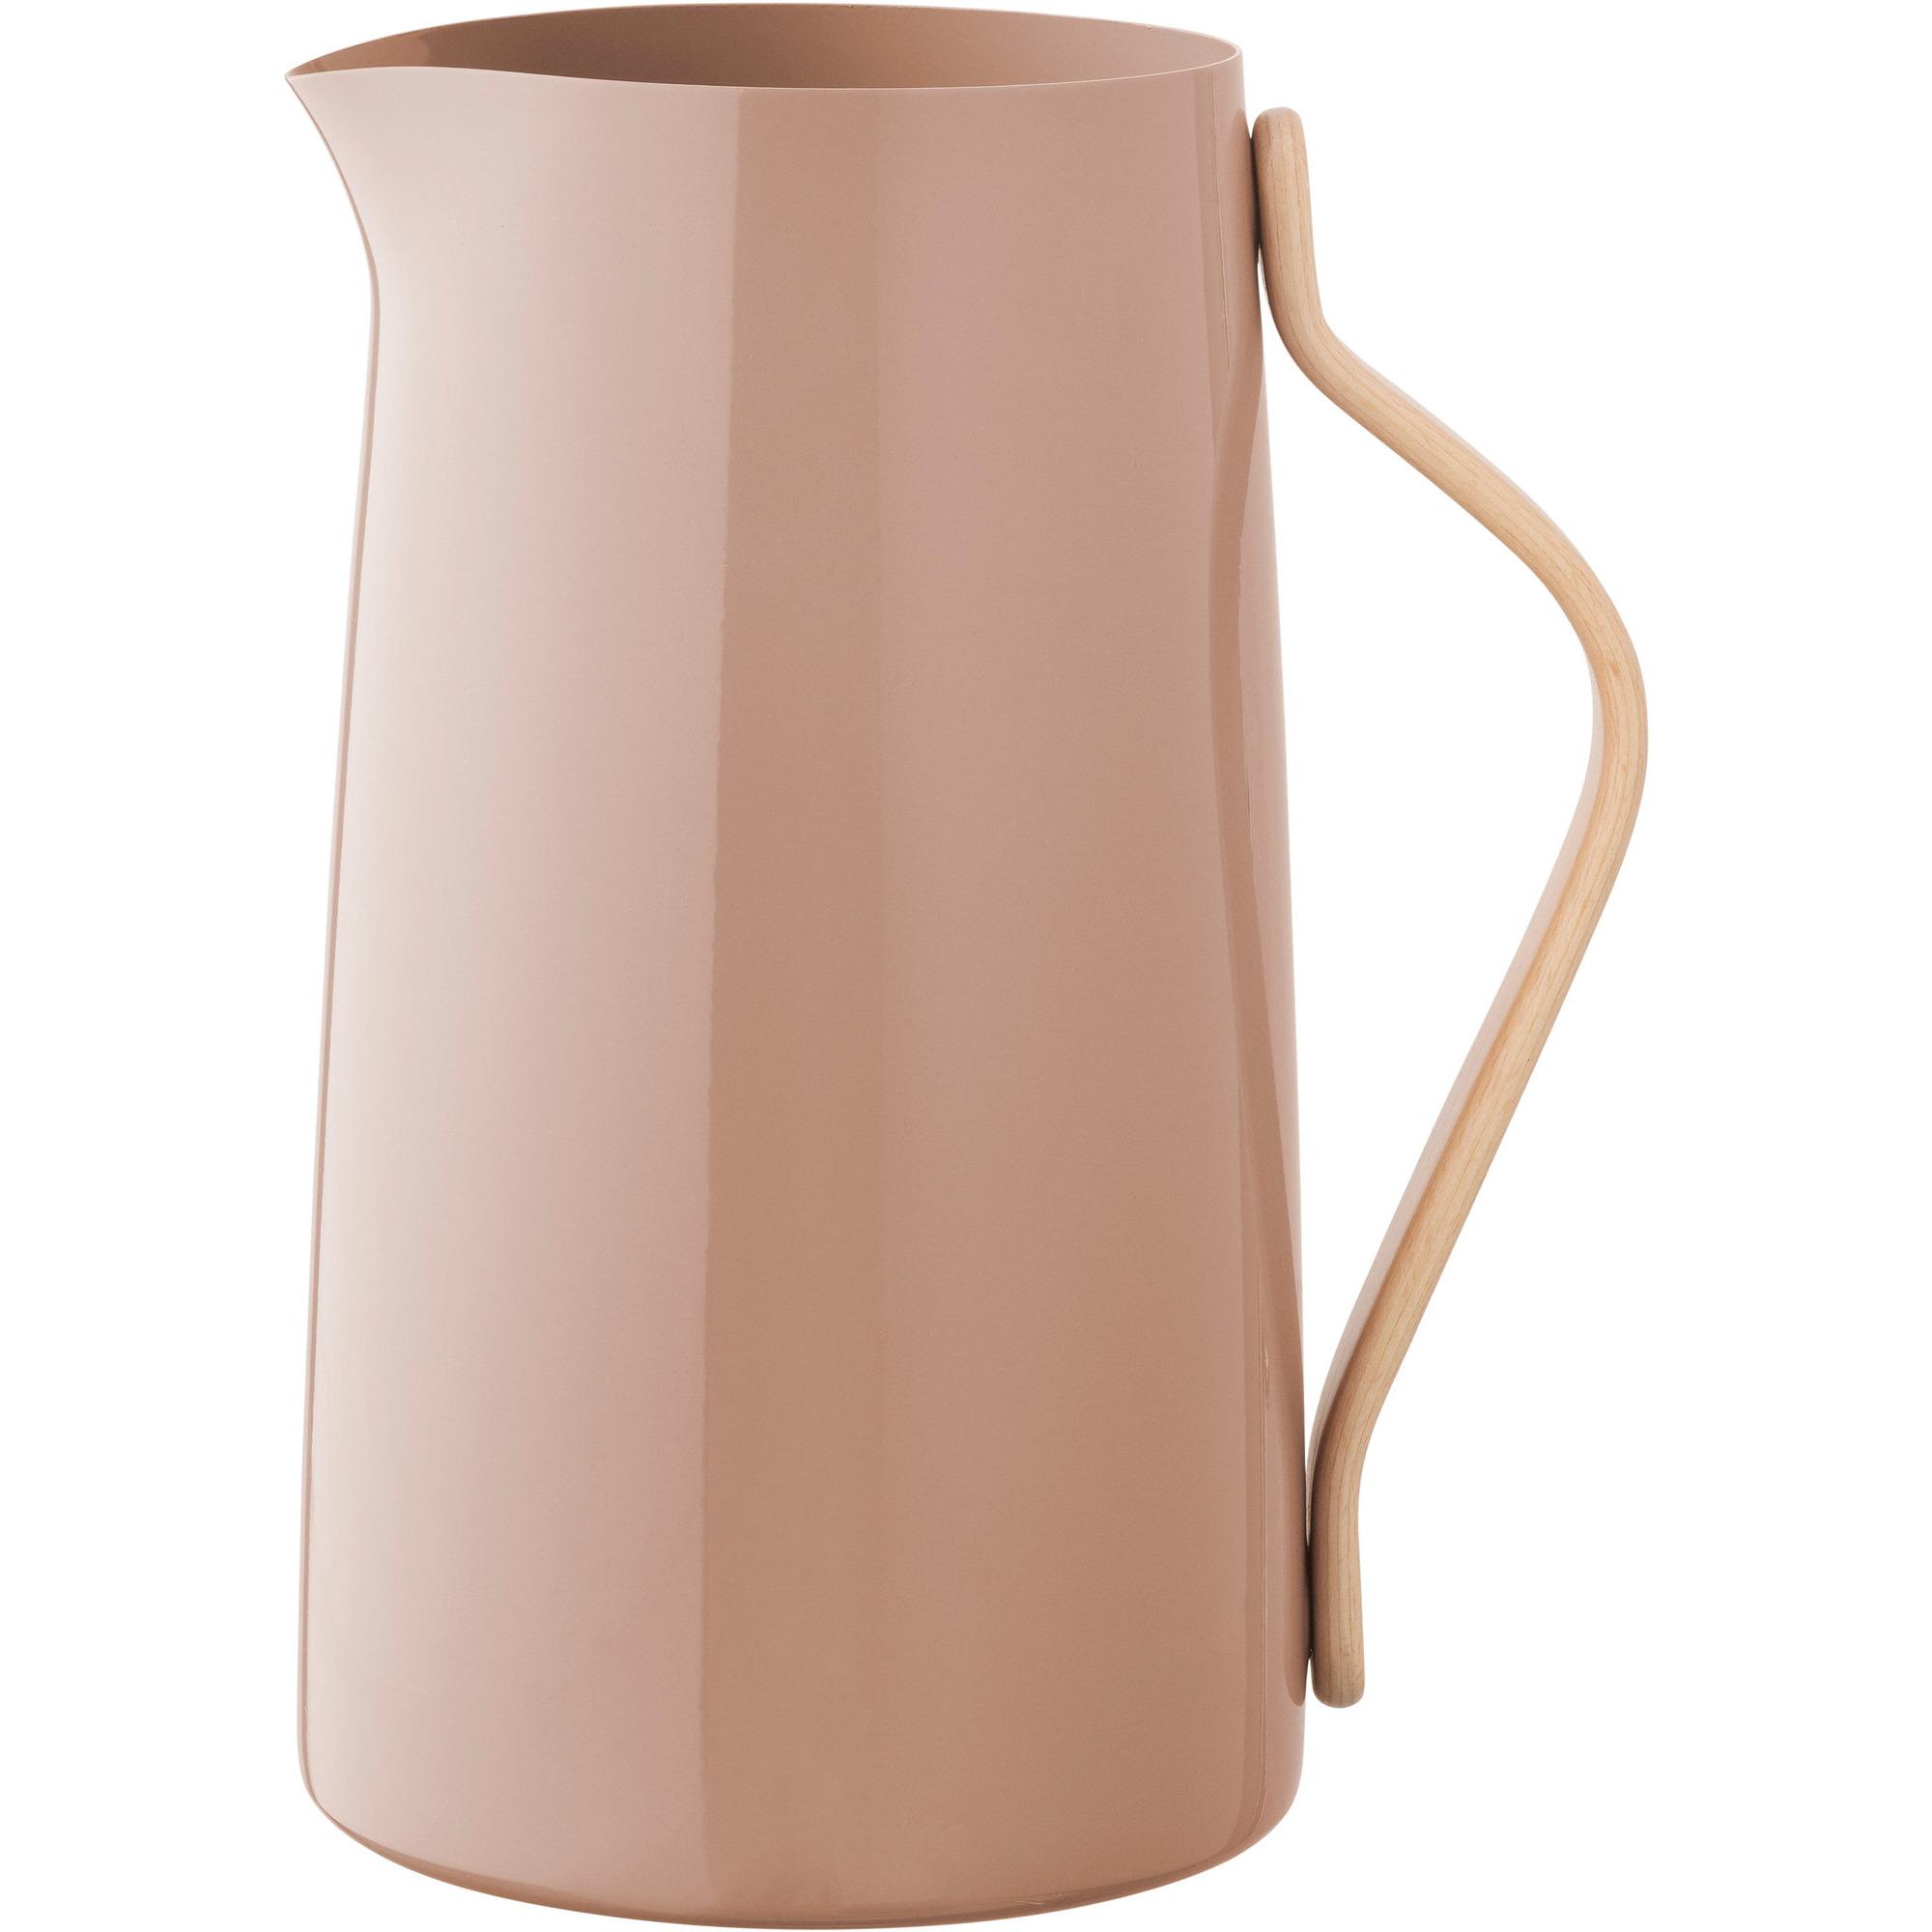 Stelton Emma Serveringskanna 2 liter Terrakotta